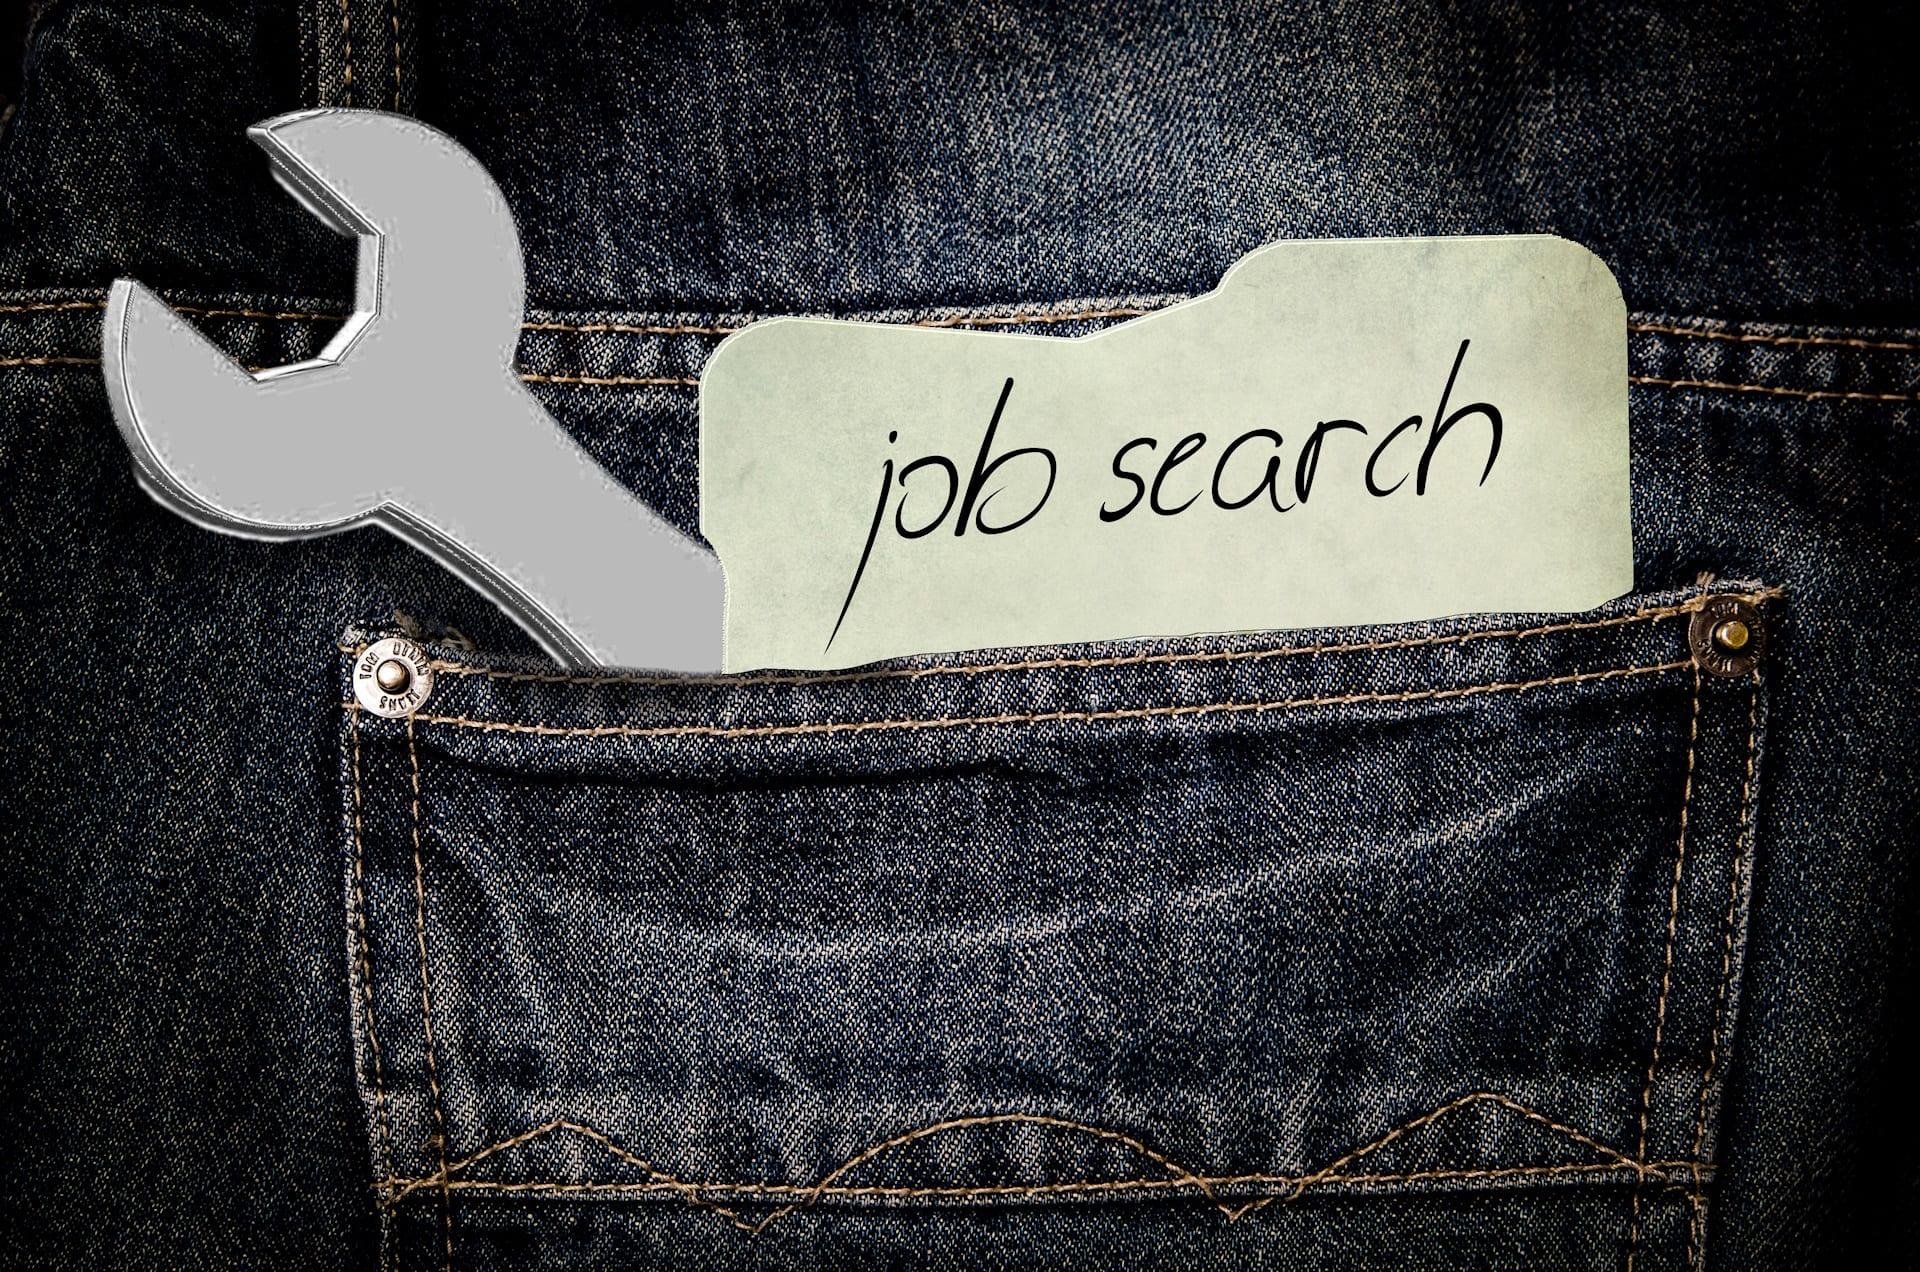 Supplementary Unemployment Benefits Plan & The Work Share Plan